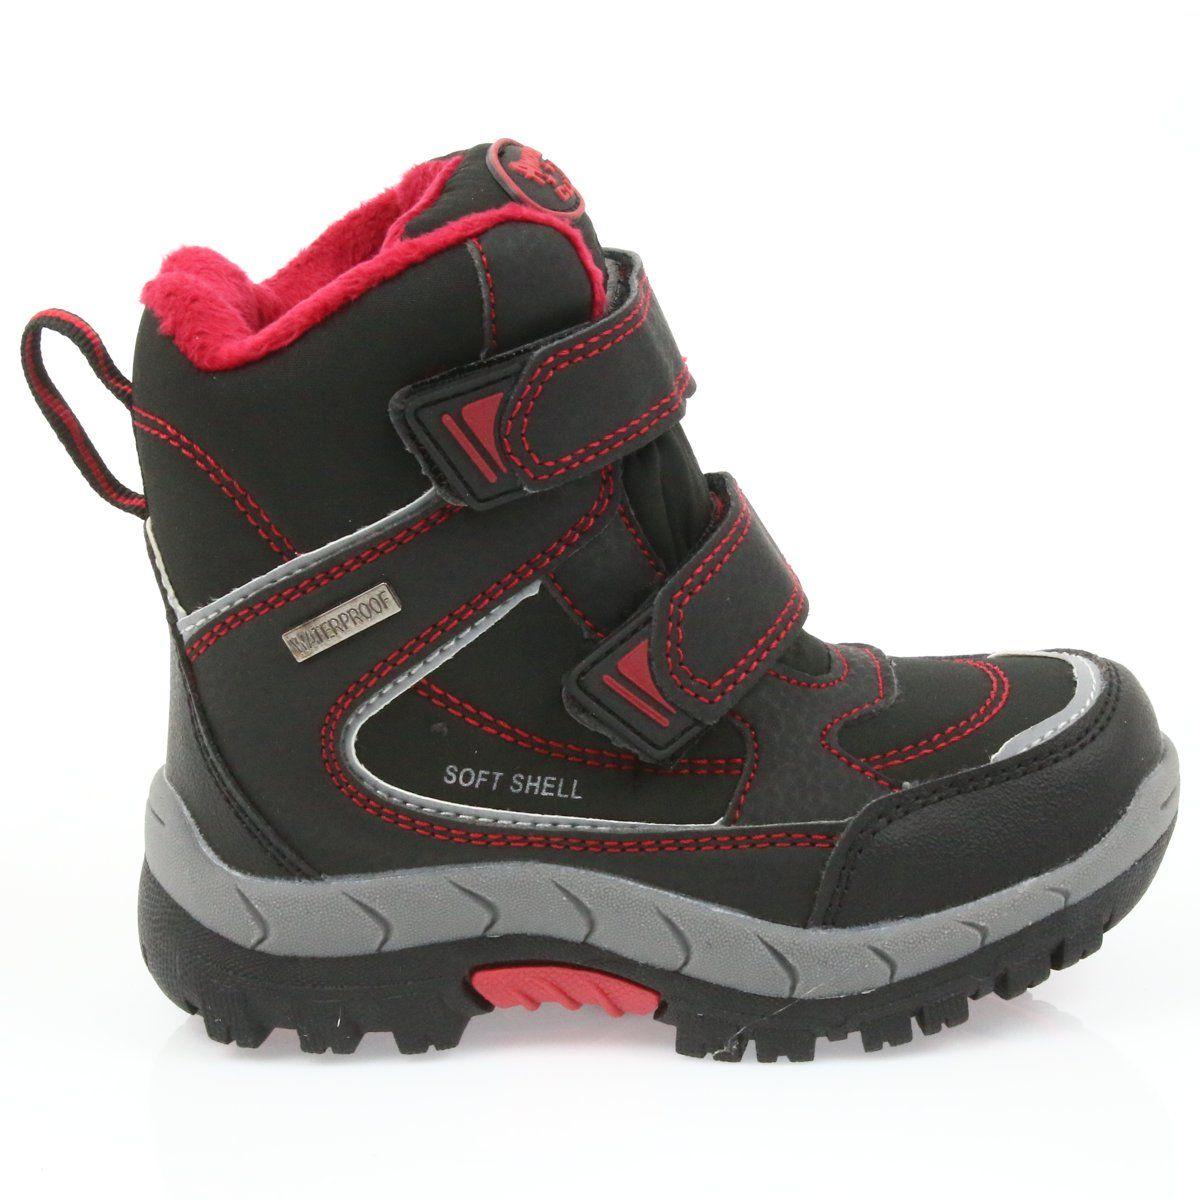 American Club American Kozaki Buty Zimowe Z Membrana 3122 Czarne Czerwone Brooks Sneaker Shoes Sneakers